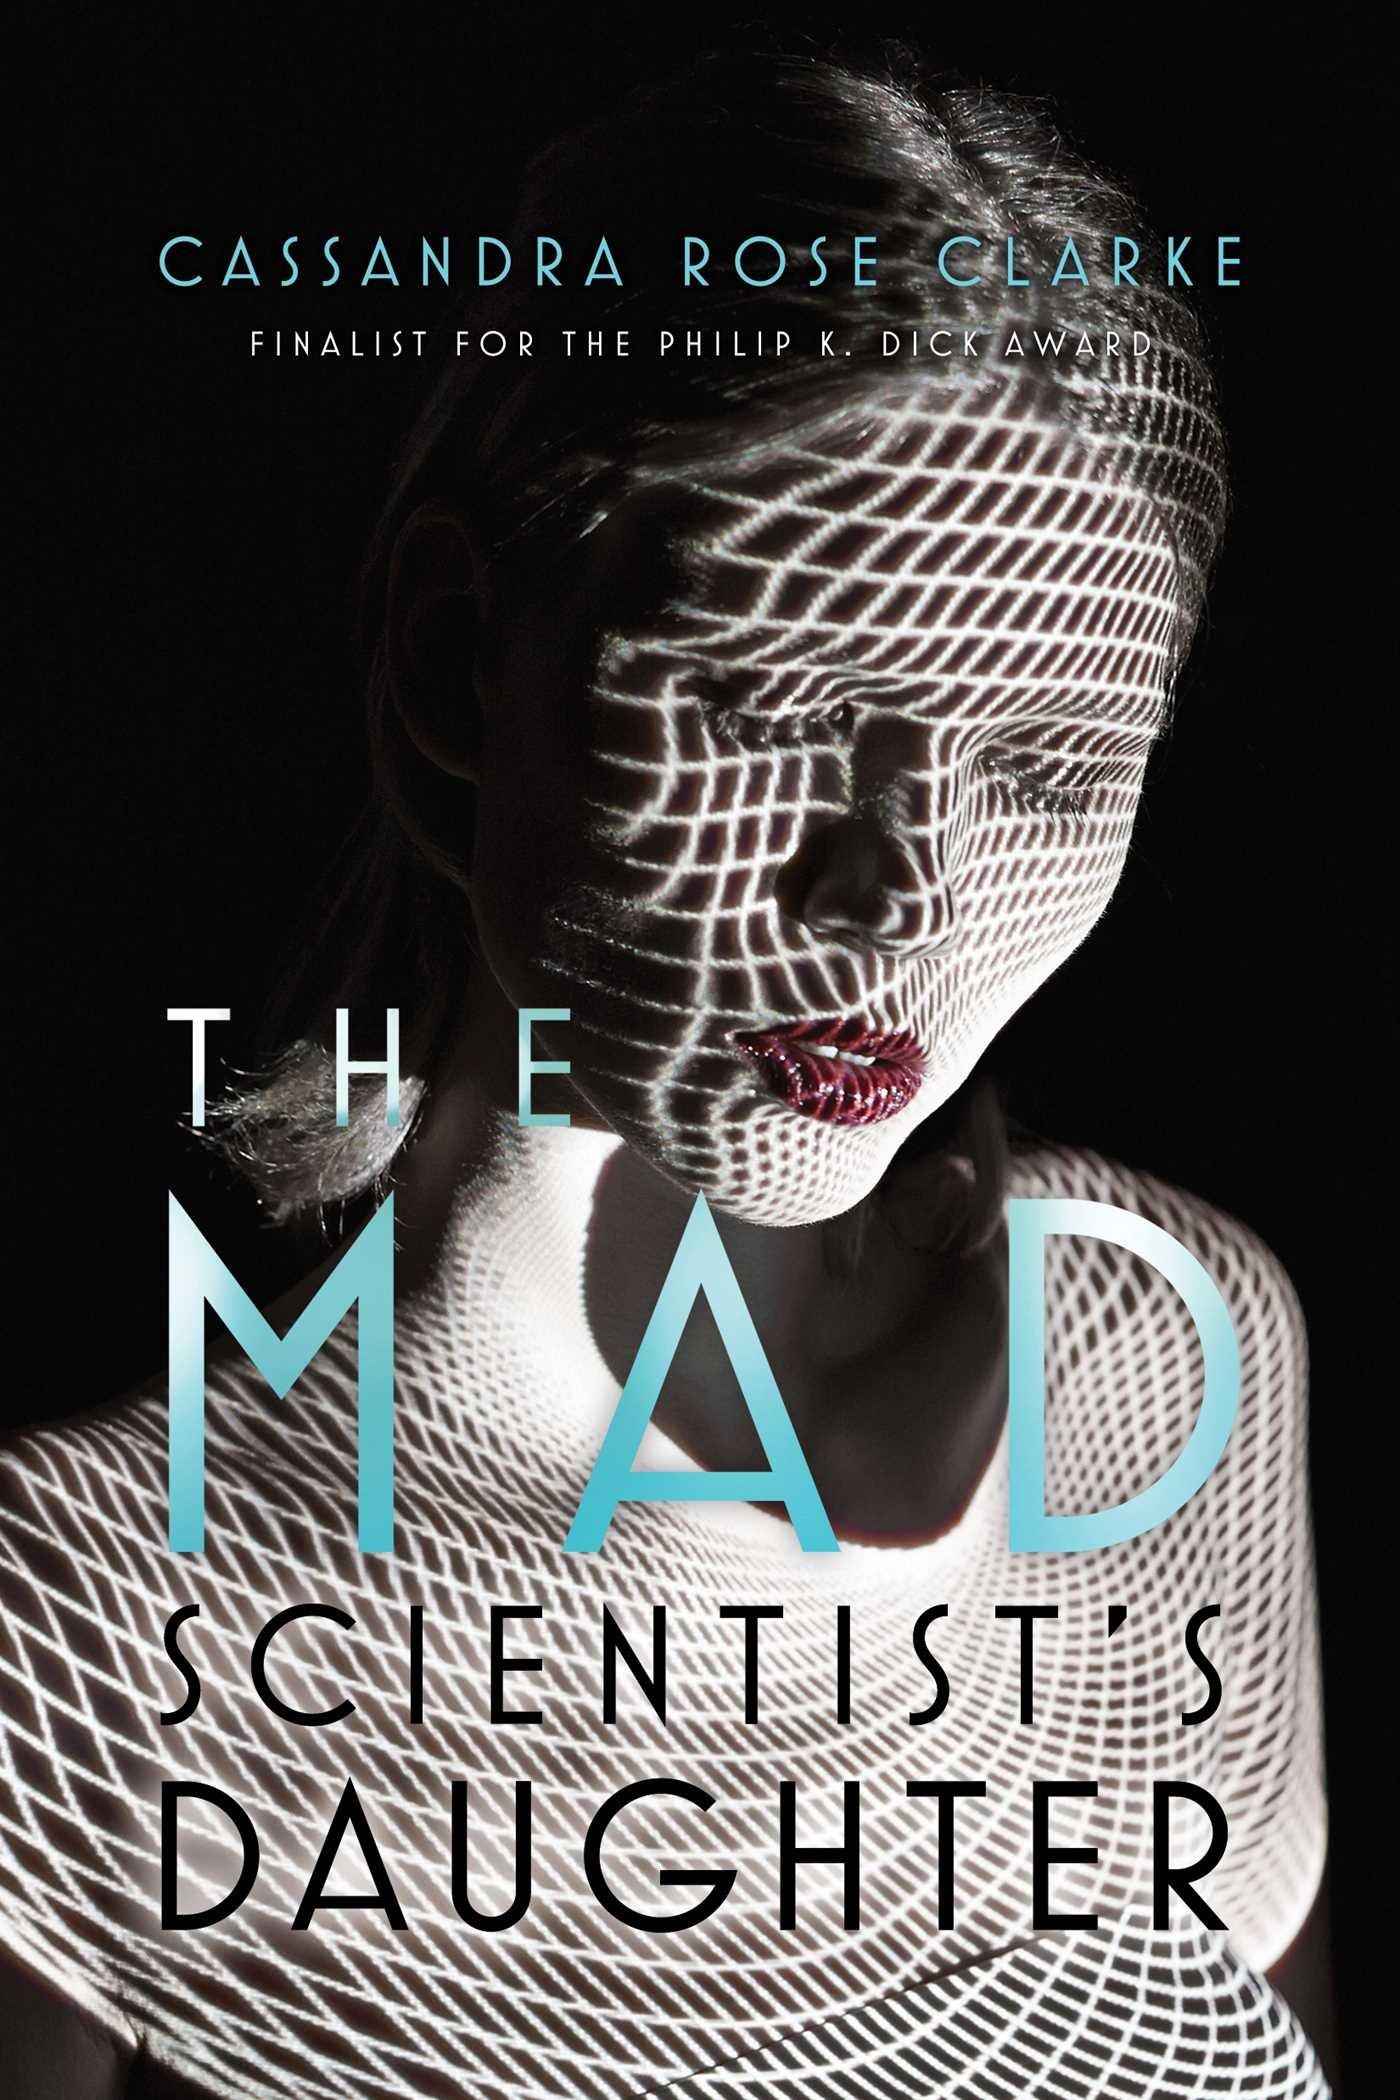 Amazon.com: The Mad Scientist's Daughter (9781481461689): Clarke, Cassandra  Rose: Books